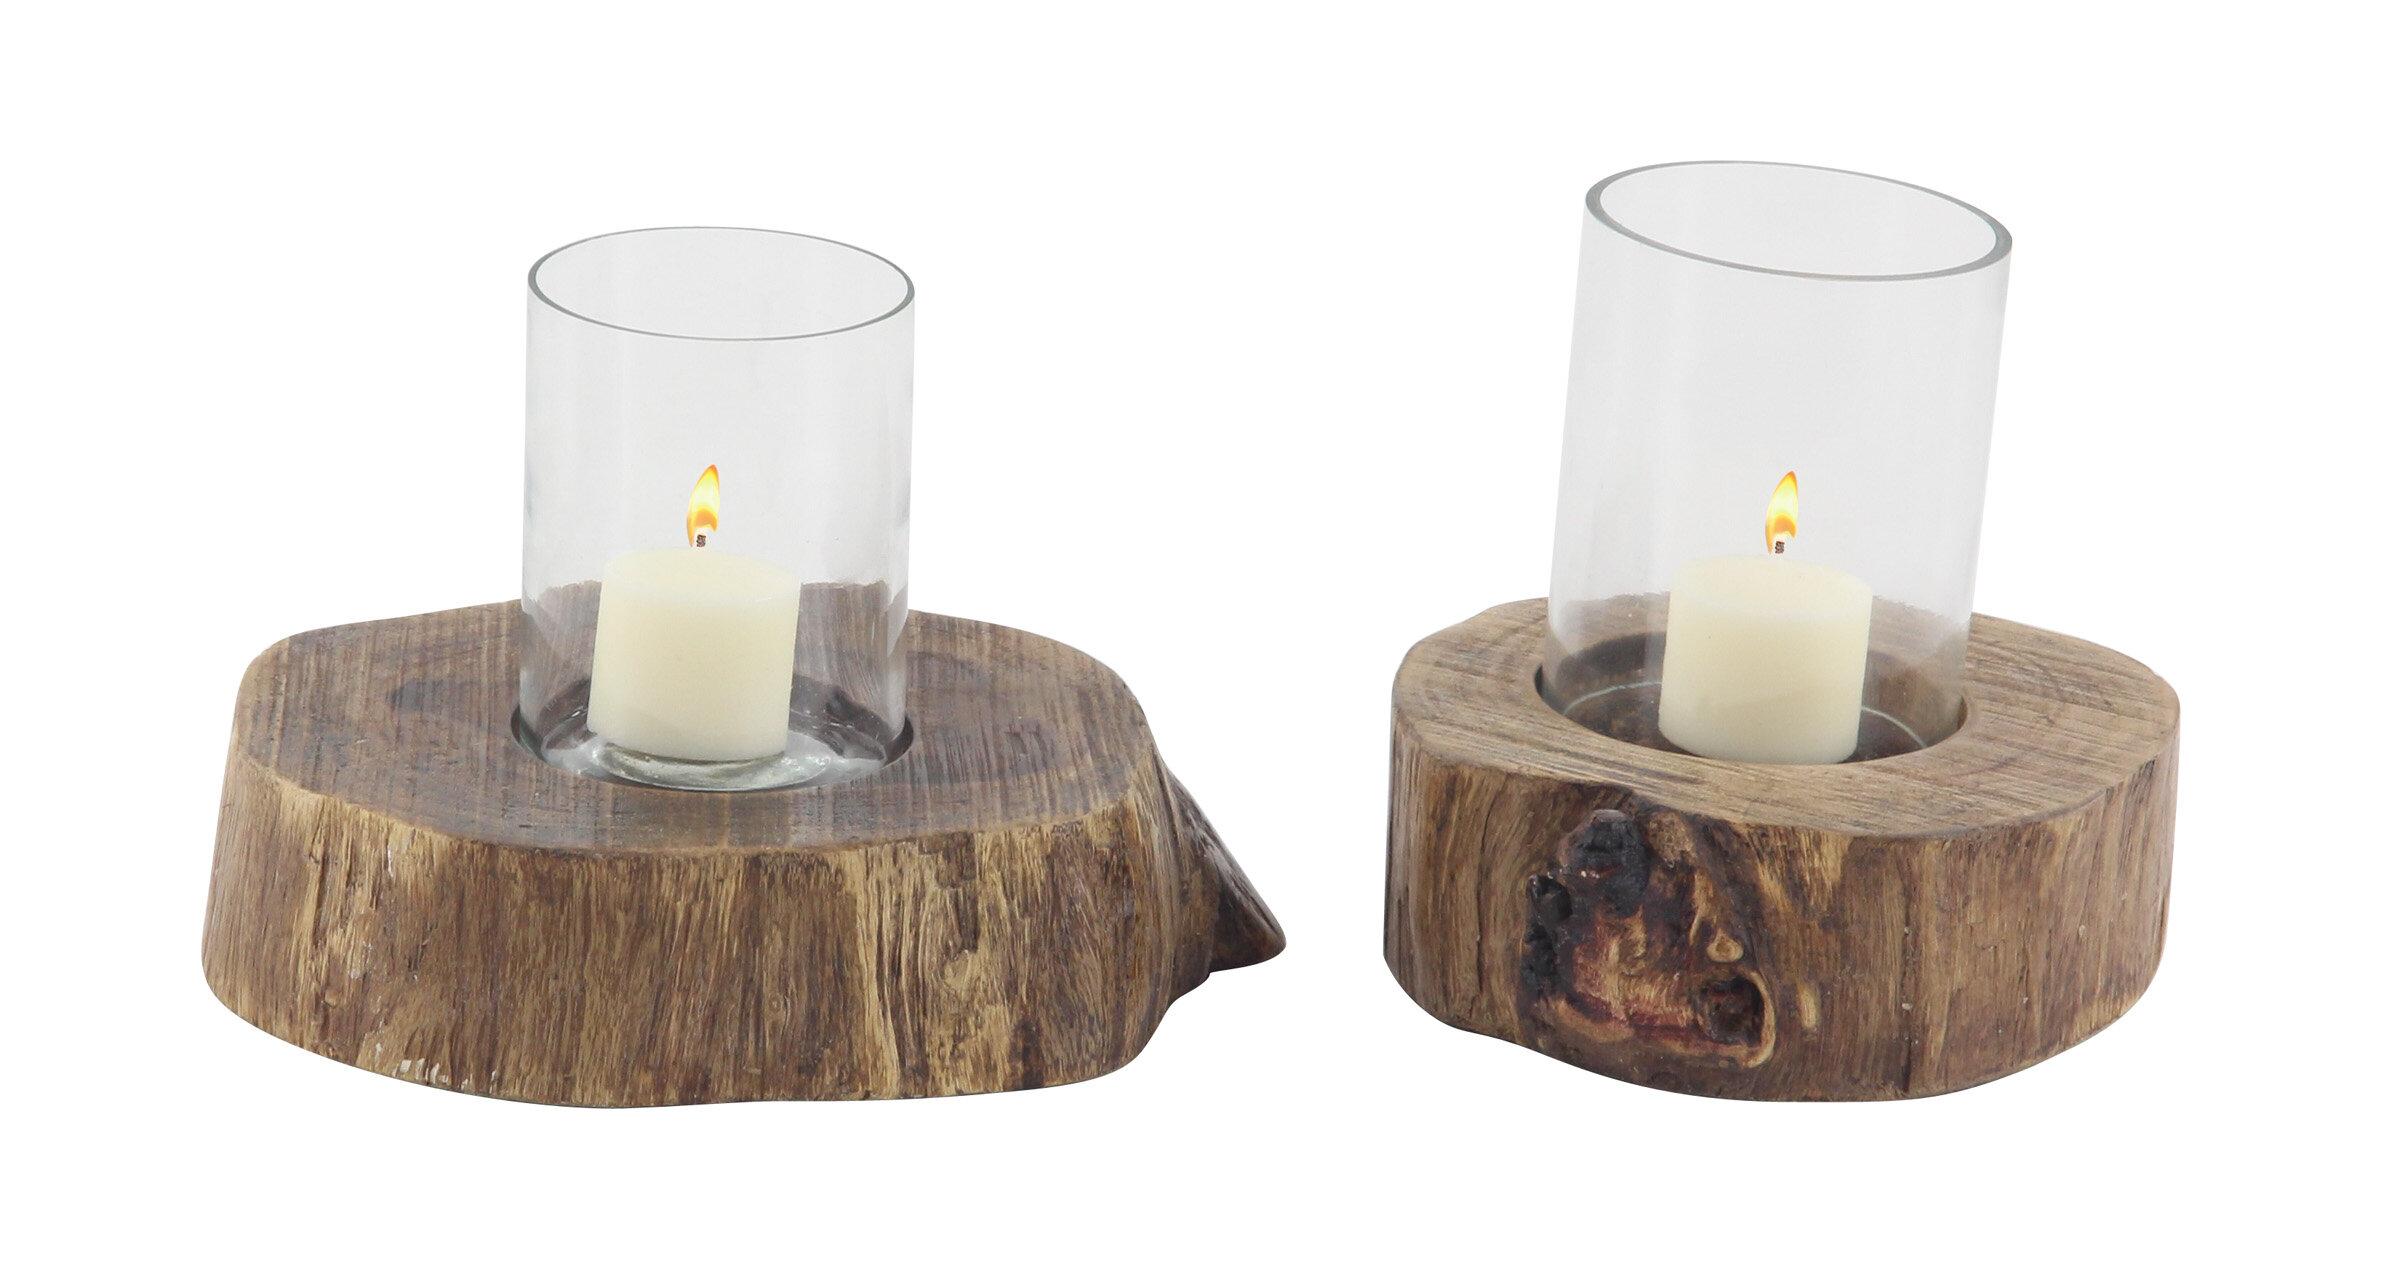 Home Furniture Diy Mango Wood Hurricane Glass Candle Holder Pillar T Tea Light Votive Centerpiece Kisetsu System Co Jp